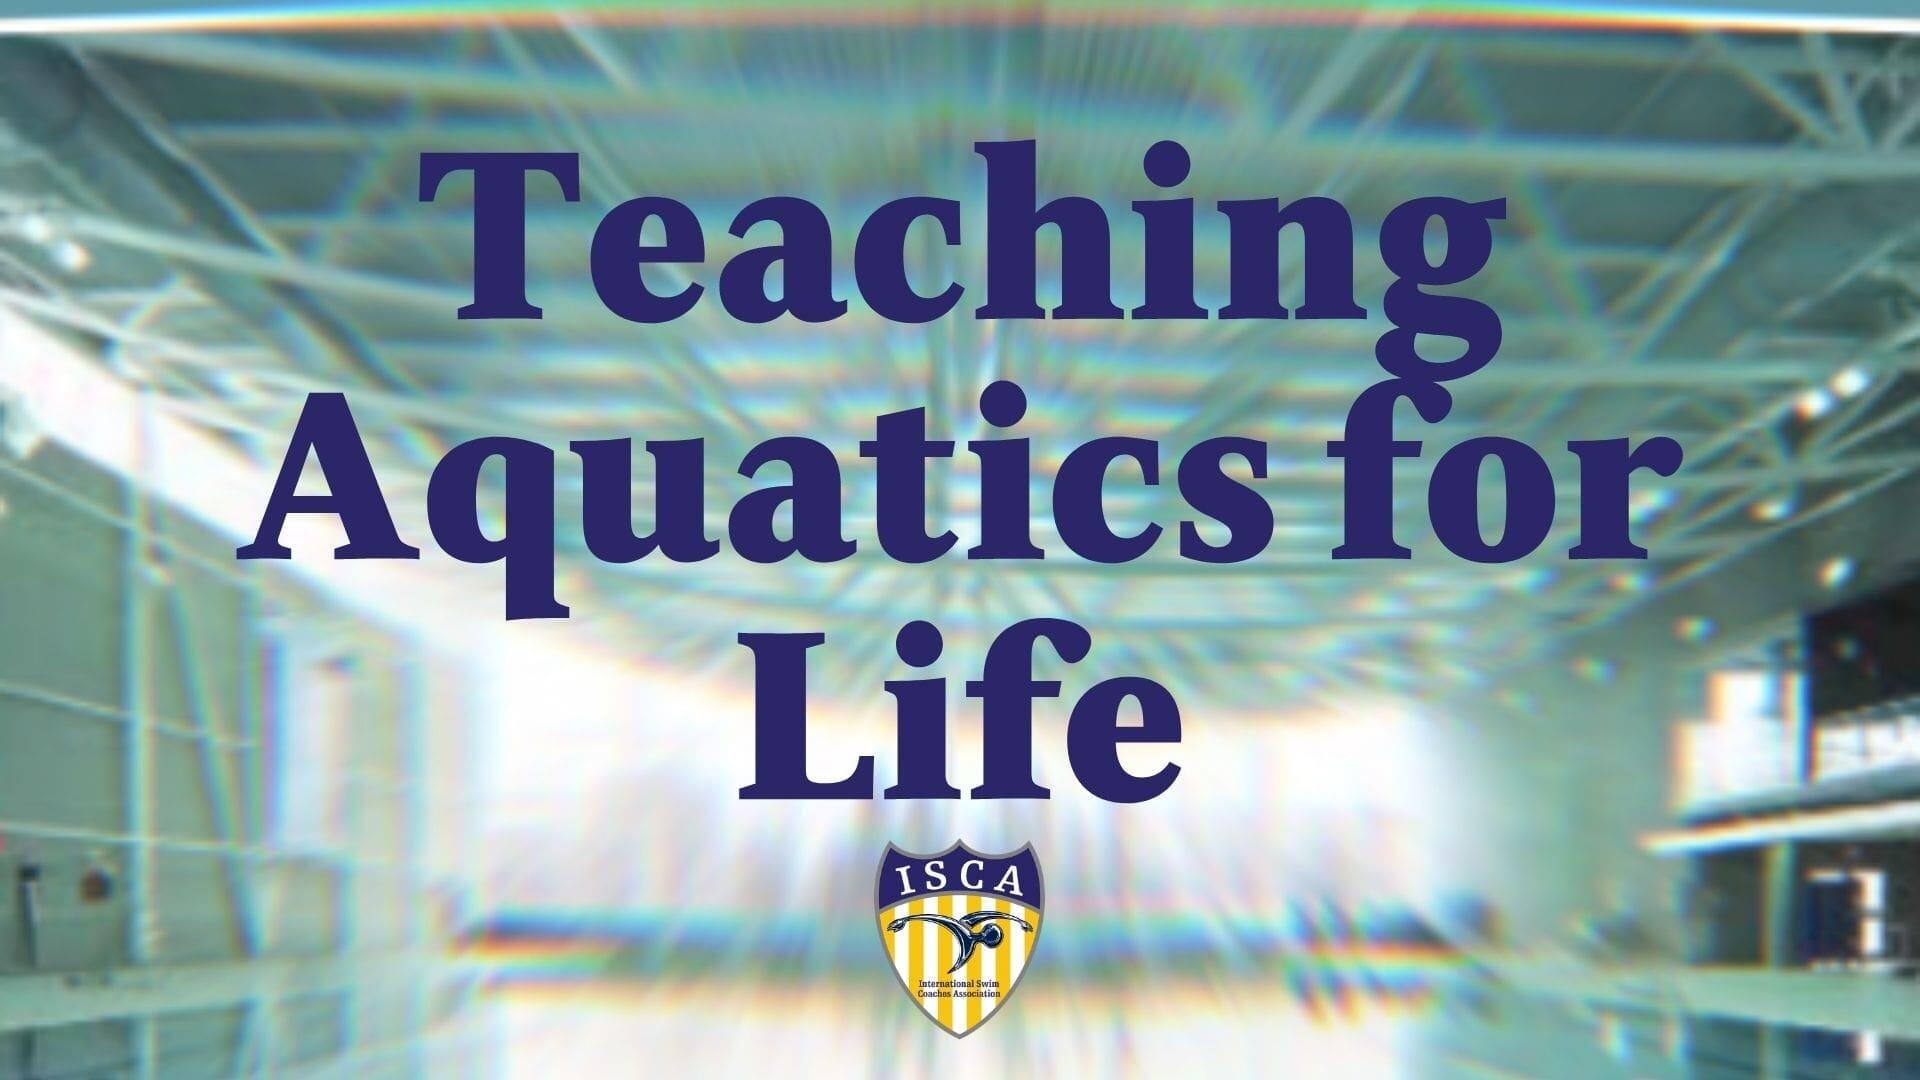 Teaching Aquatics for Life